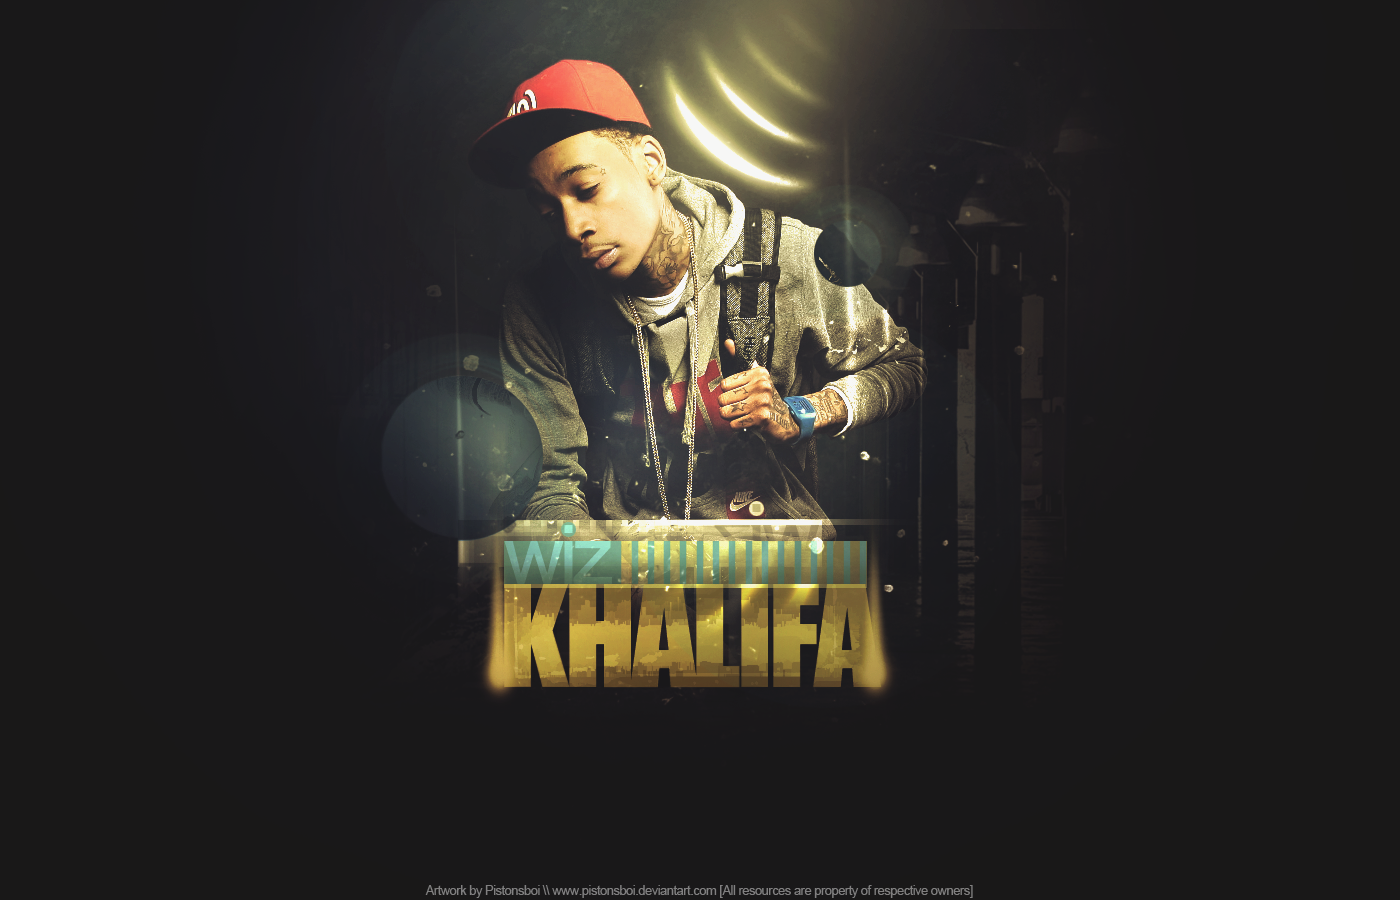 wiz khalifa by pistonsboi here wp high resolution desktop 1400x900 hd 1400x900